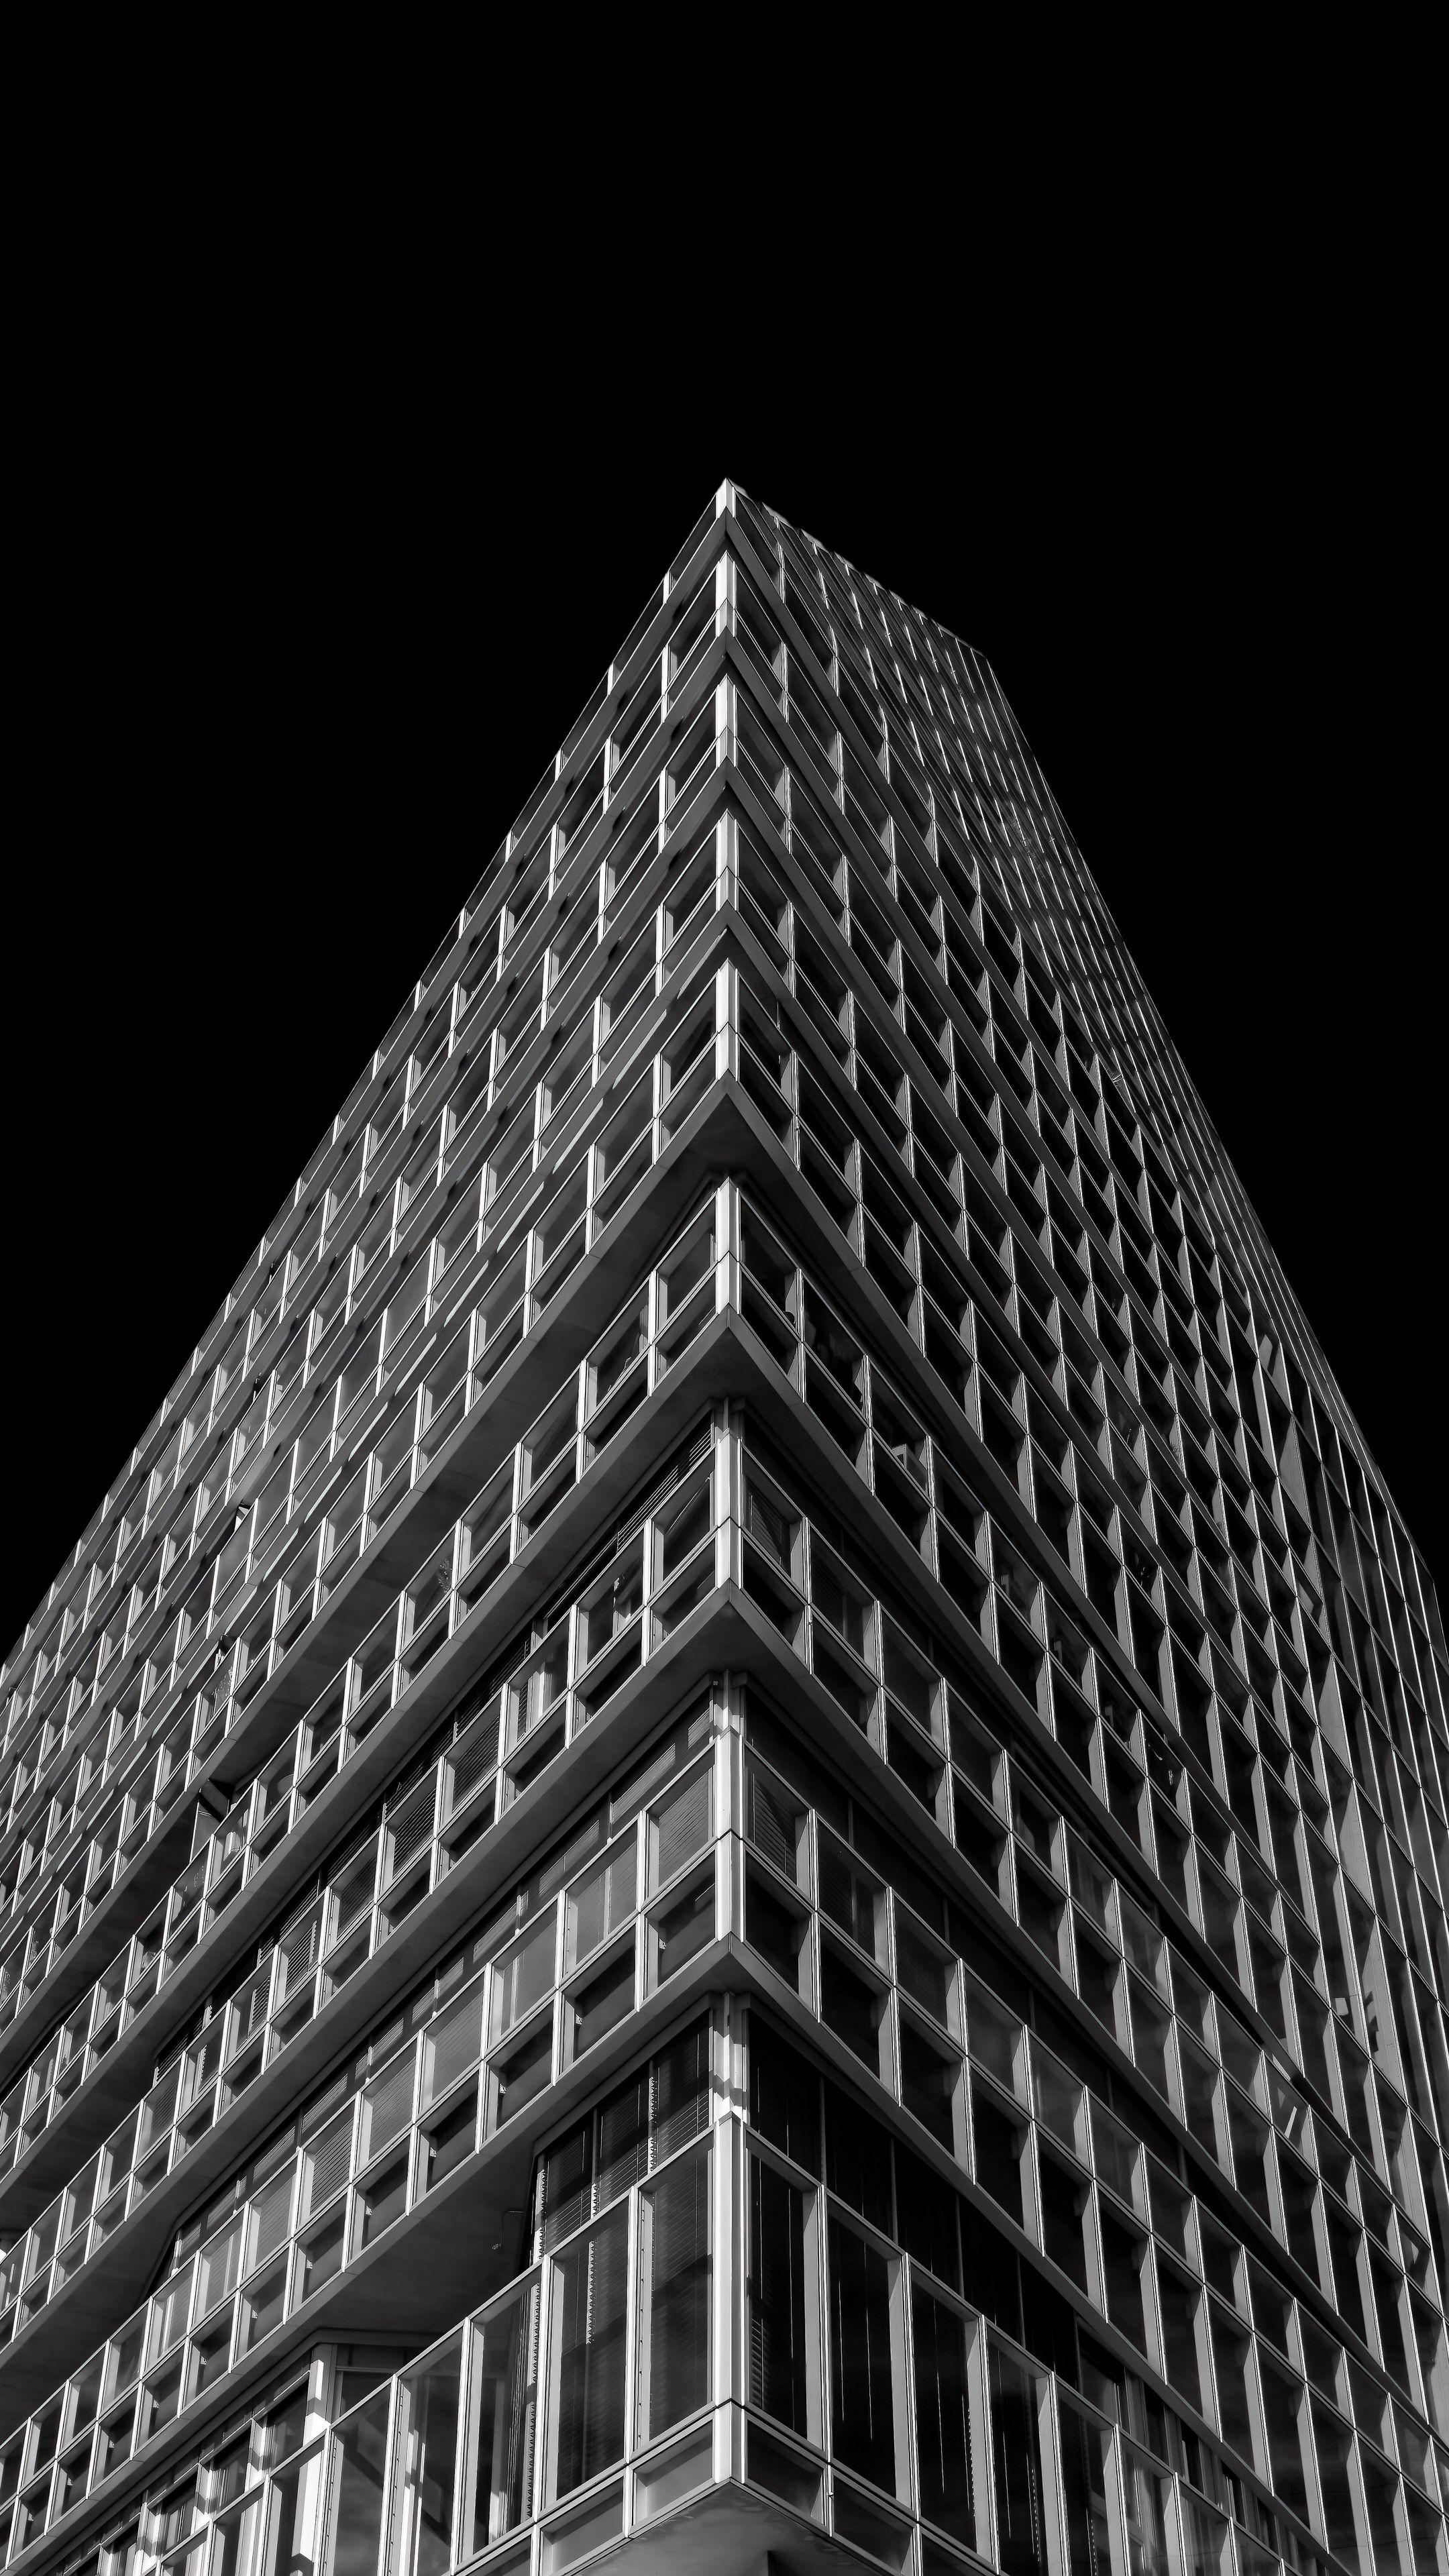 2160x3840 Wallpaper building, architecture, minimalism, black and white, black